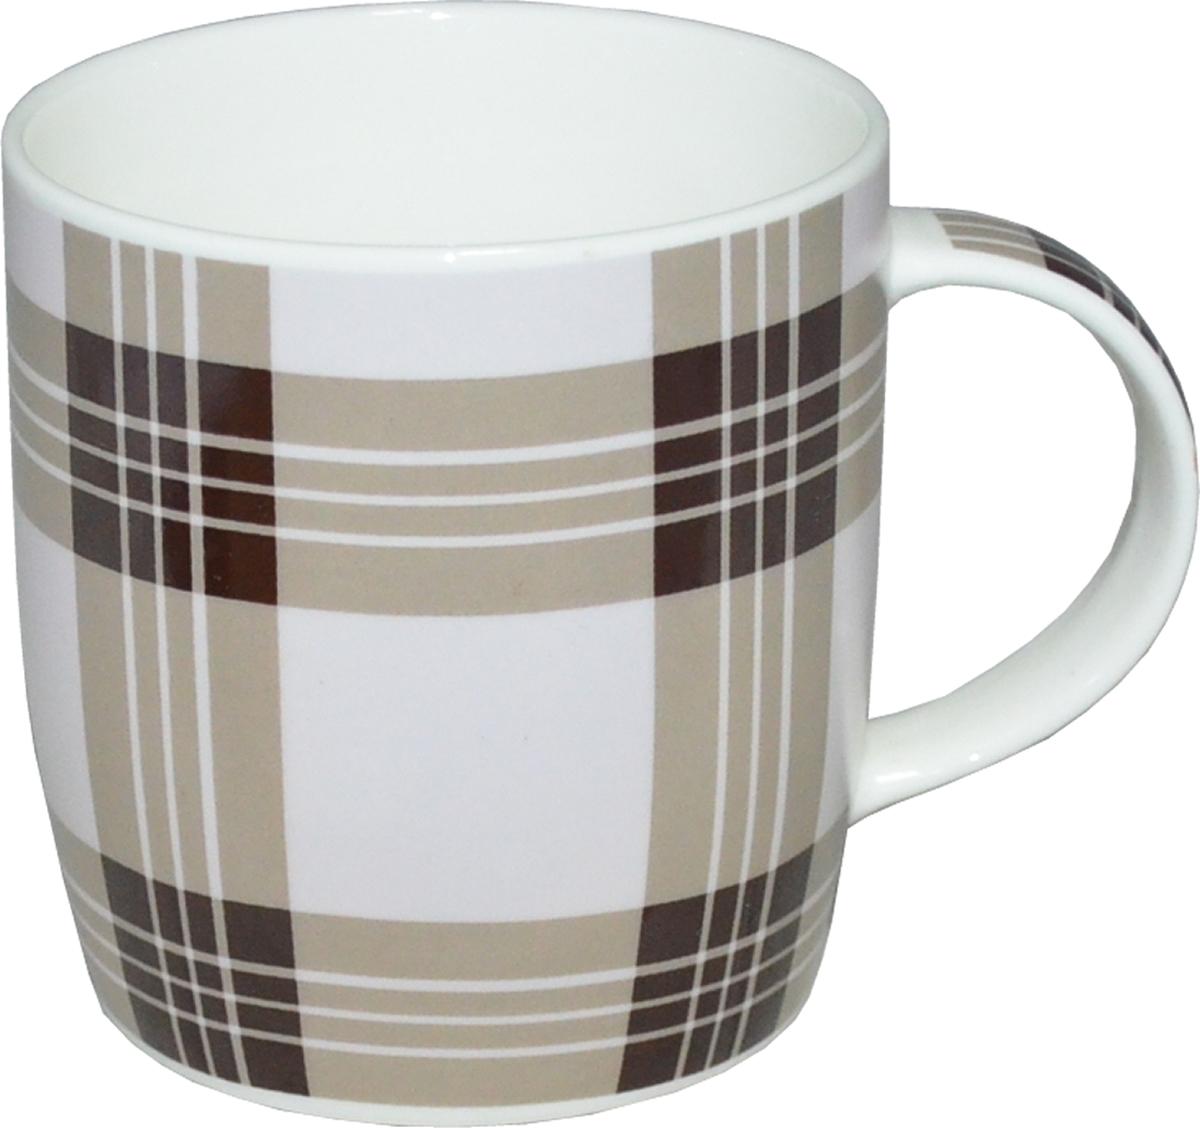 Кружка Rainbow Шотландка, 350 мл. TLND1-39 кружка 350мл фаянс коричневый